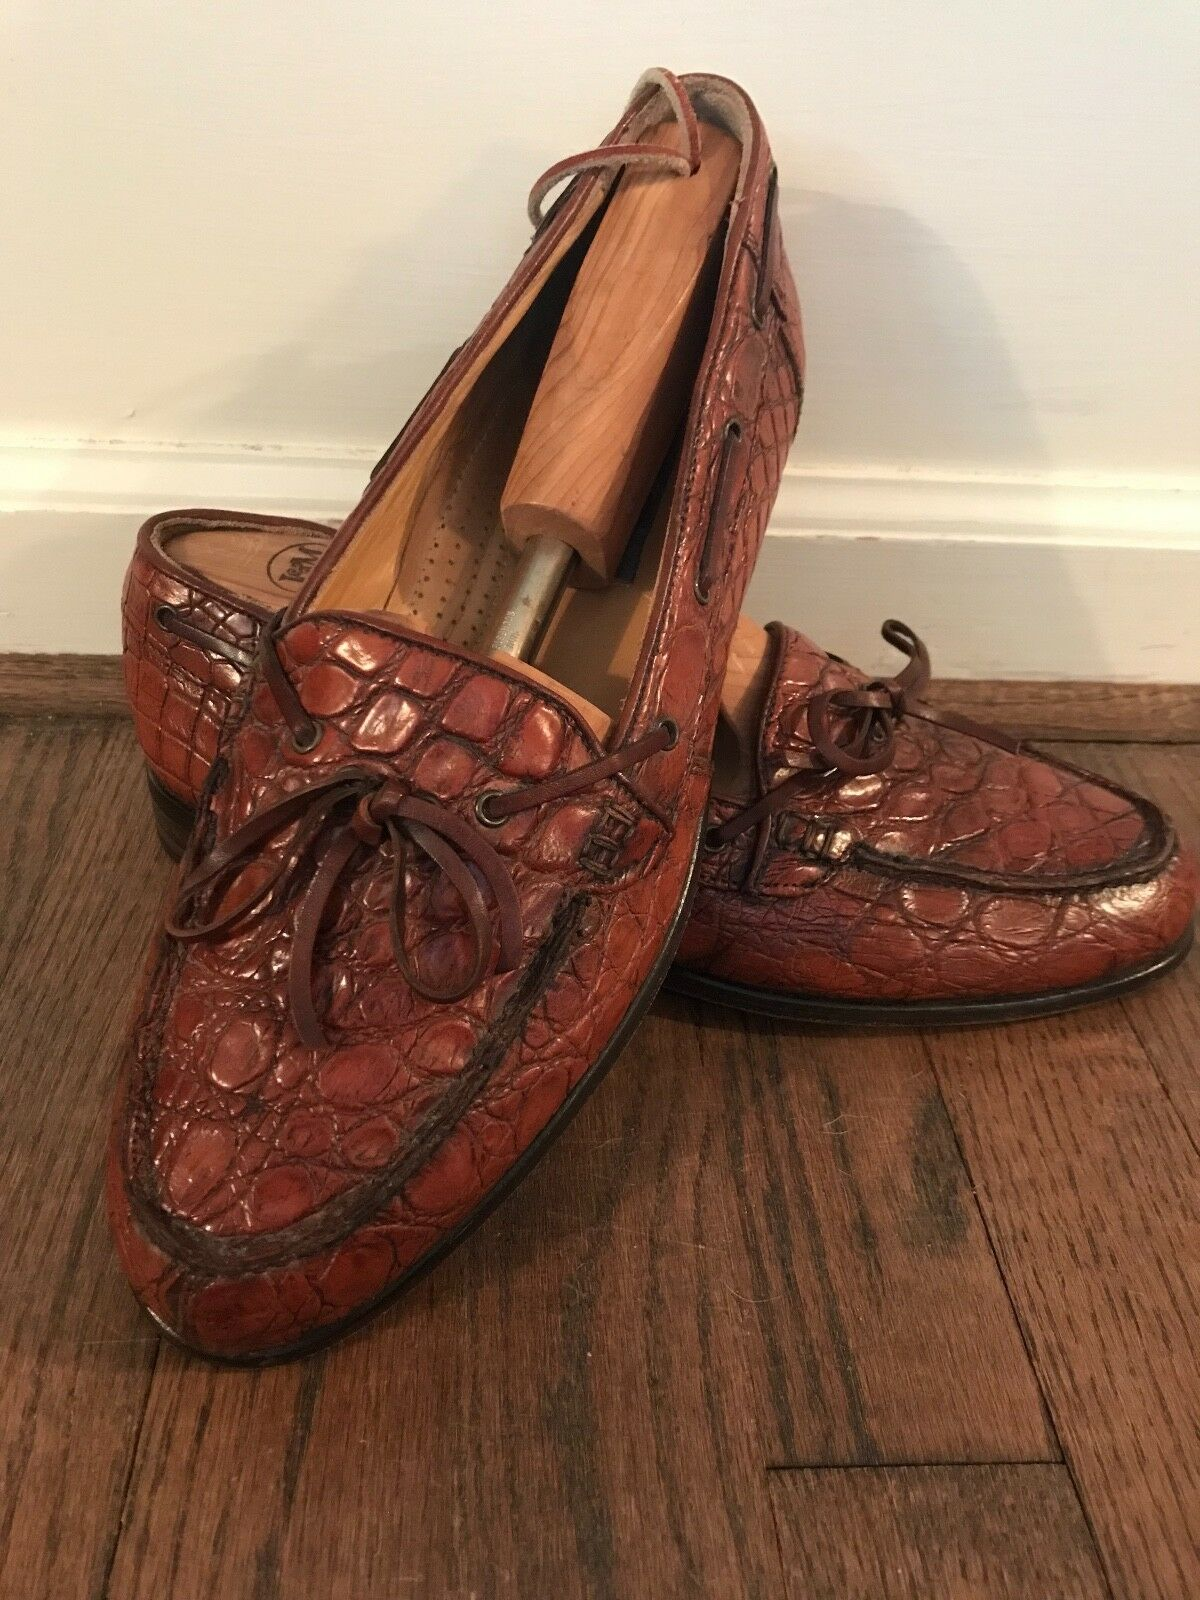 Zelli Doral Crocodile Twist Tie Loafers, 9.5 W, Cognac brown, Worn once